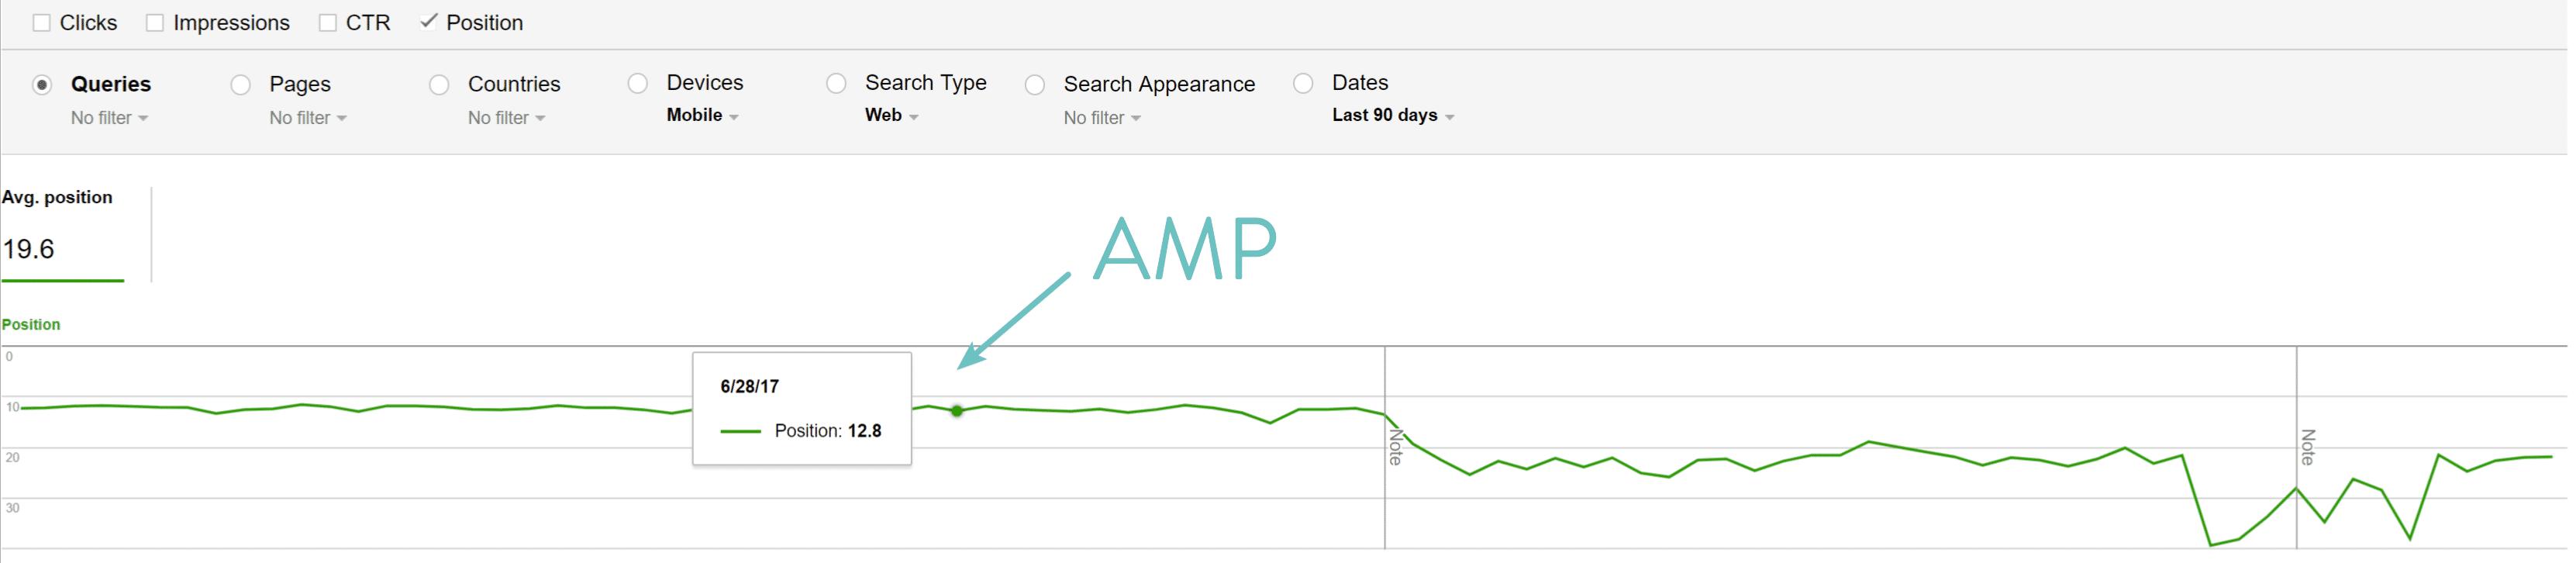 Google AMPの掲載順位に対するデータ